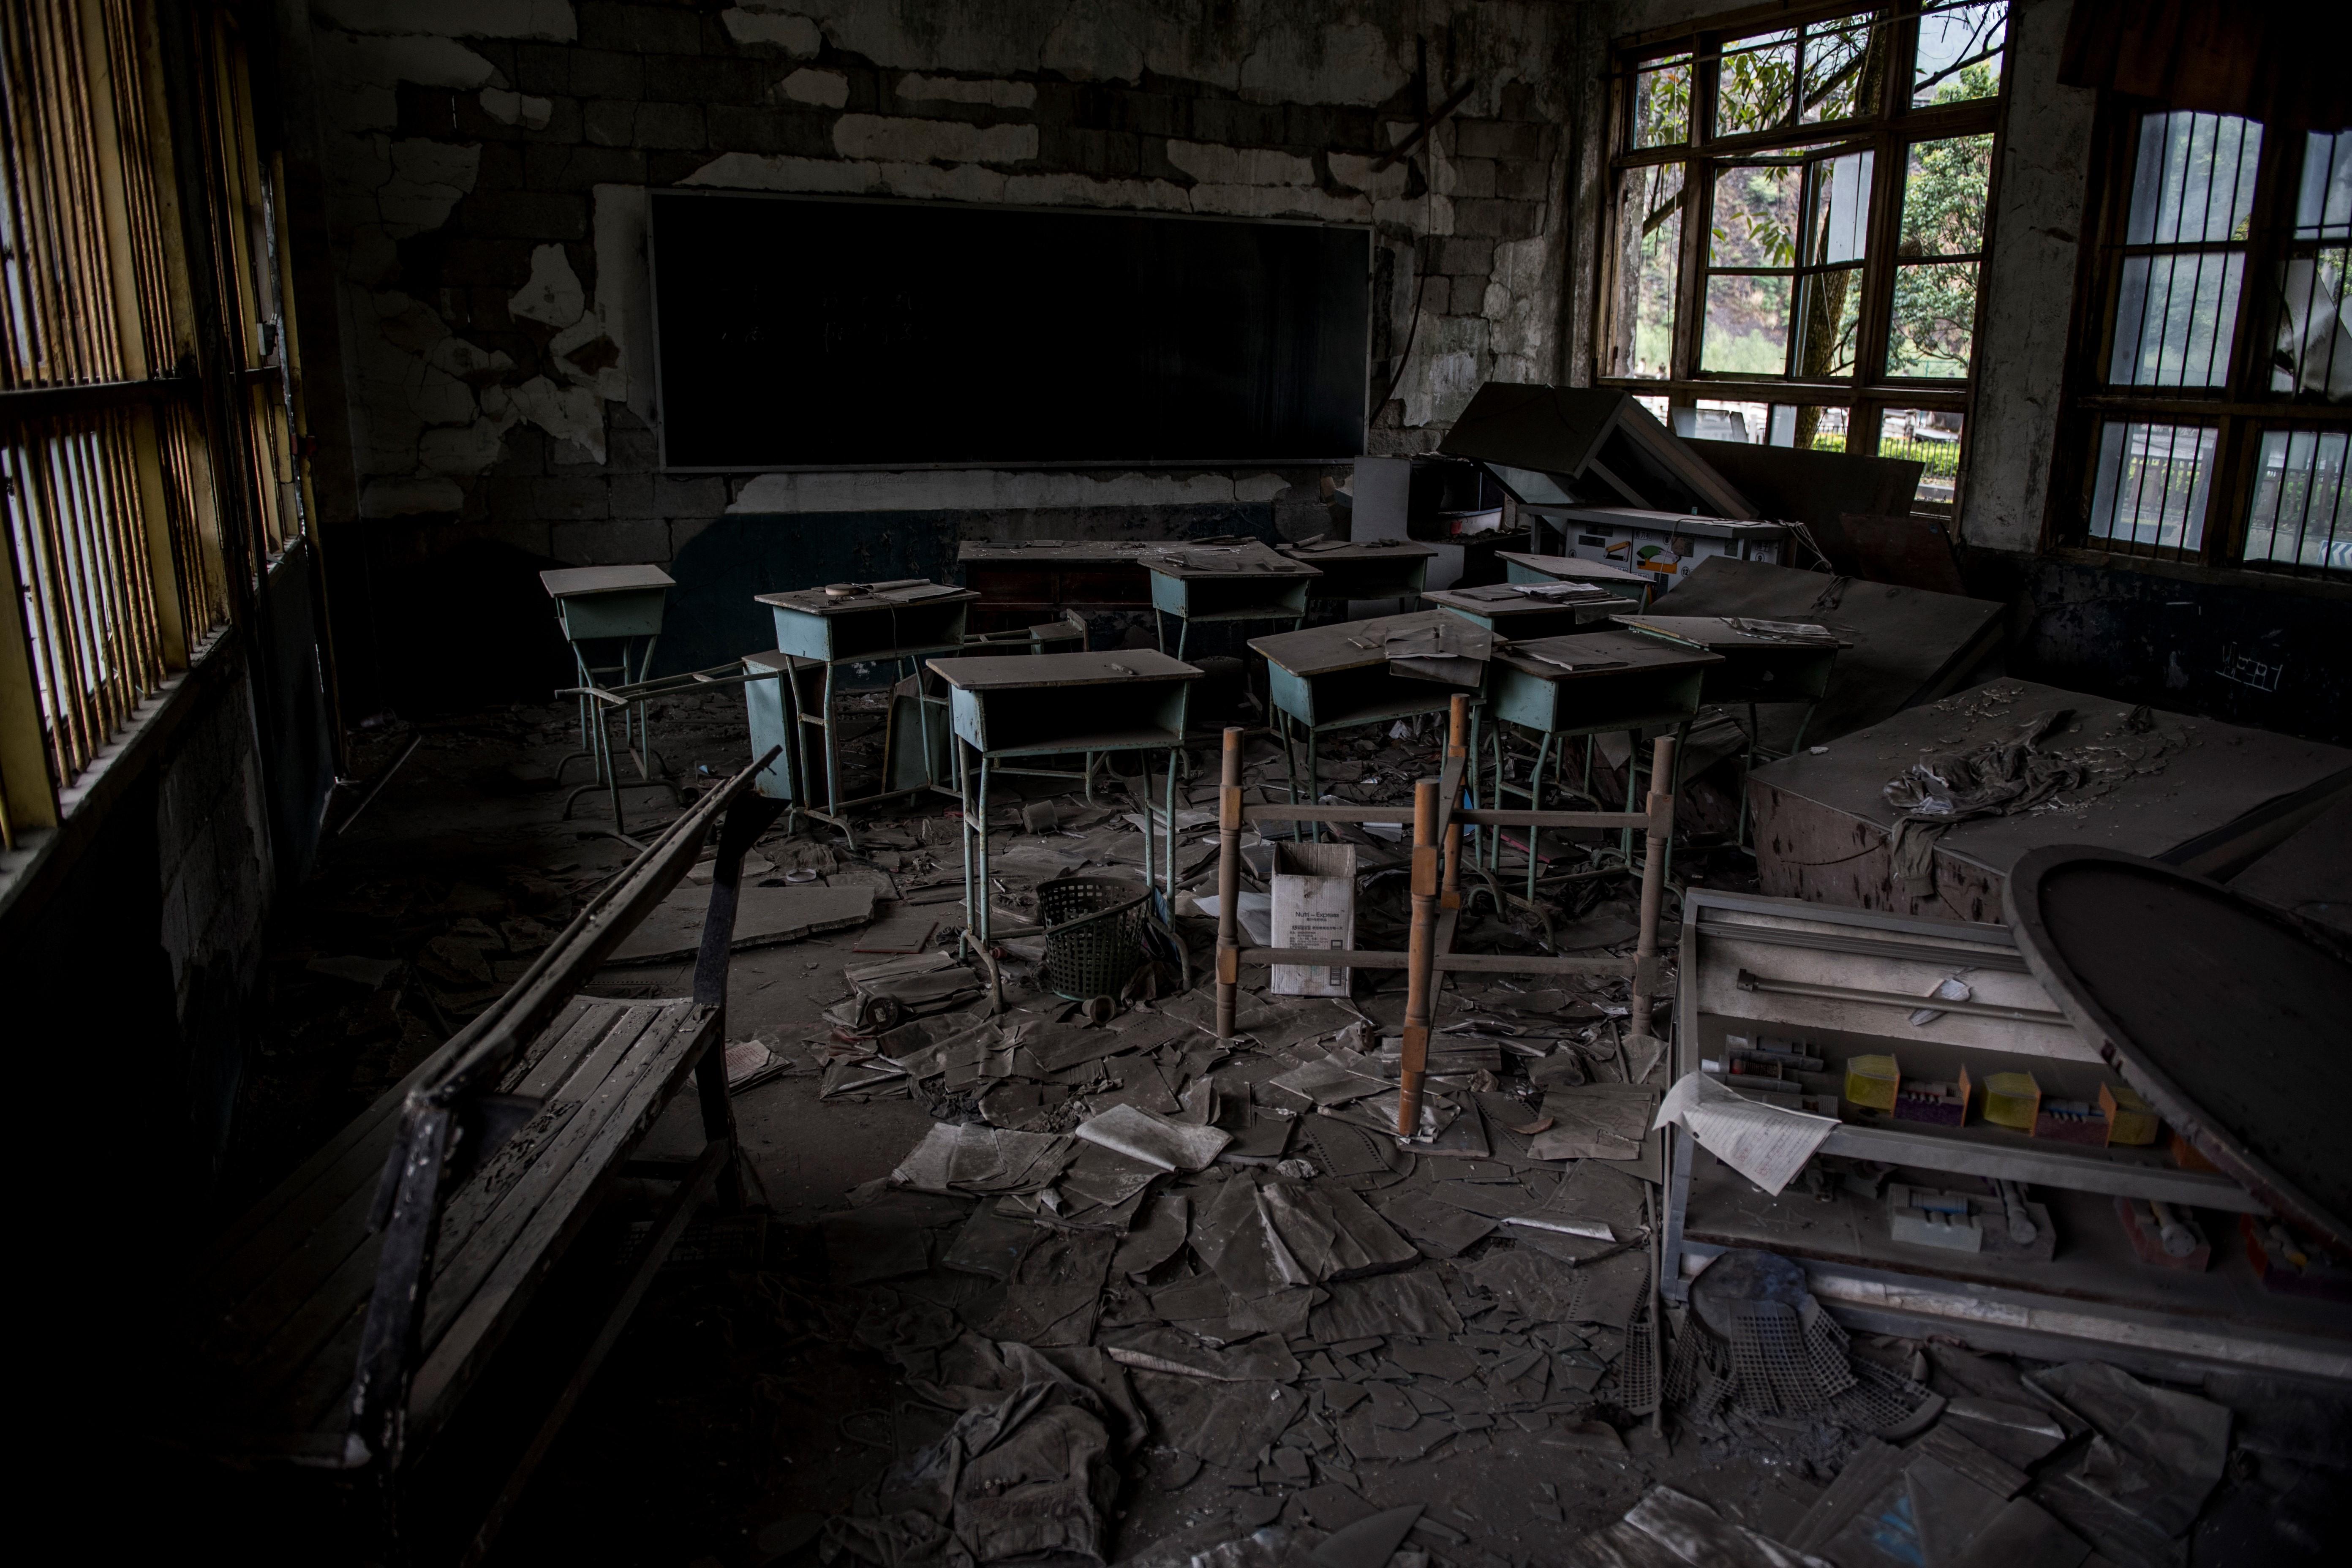 Un aula del colegio (AFP / Johannes EISELE)